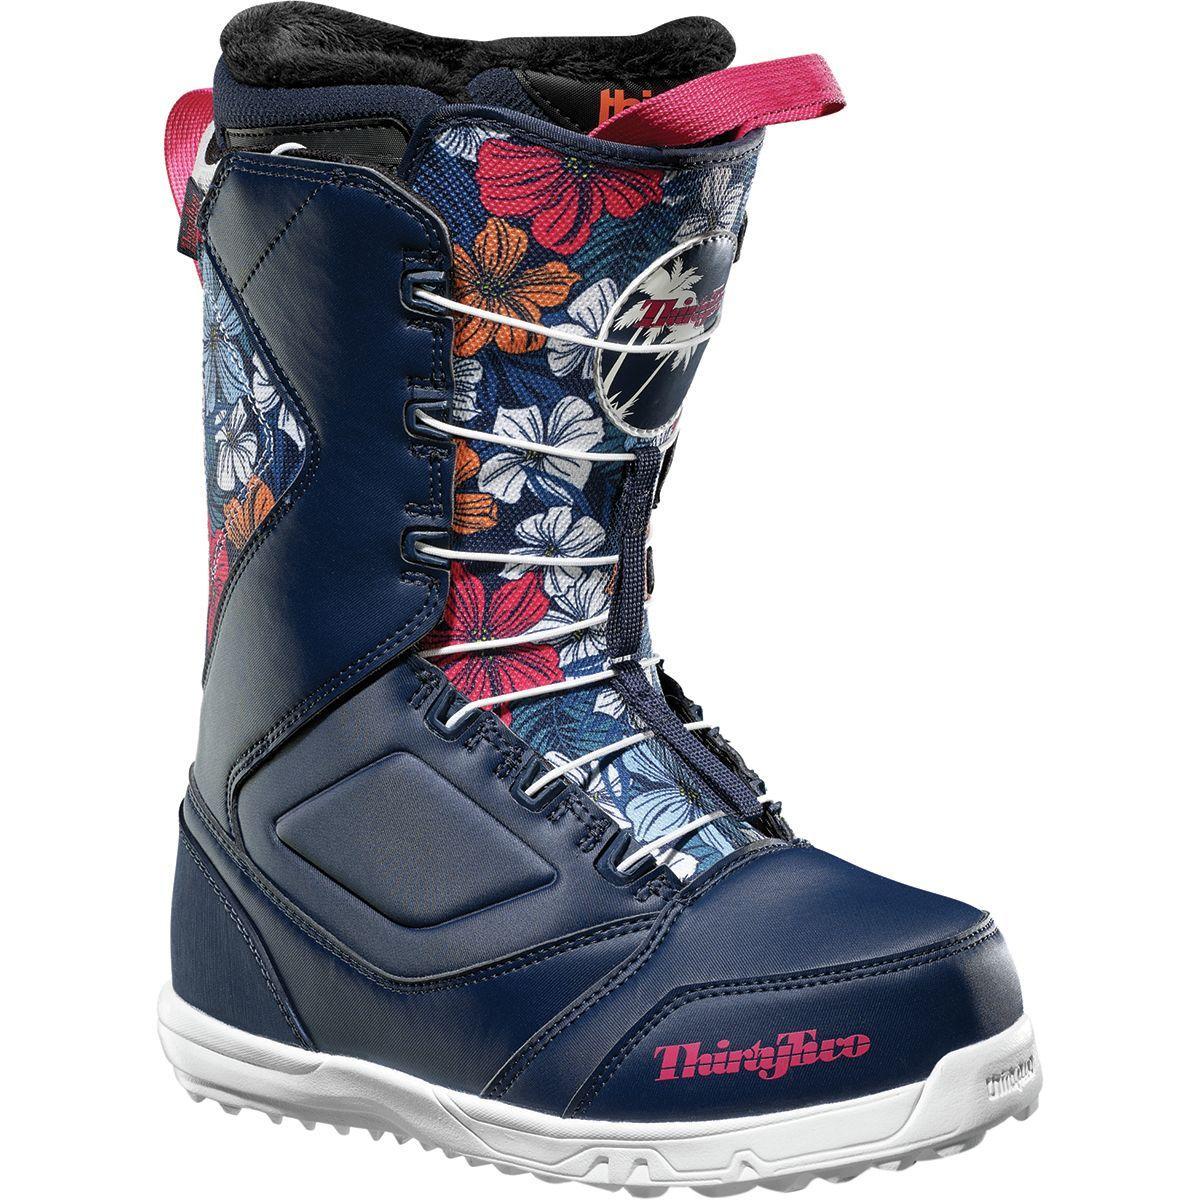 ThirtyTwo Zephyr FT Speedlace Snowboard Boot